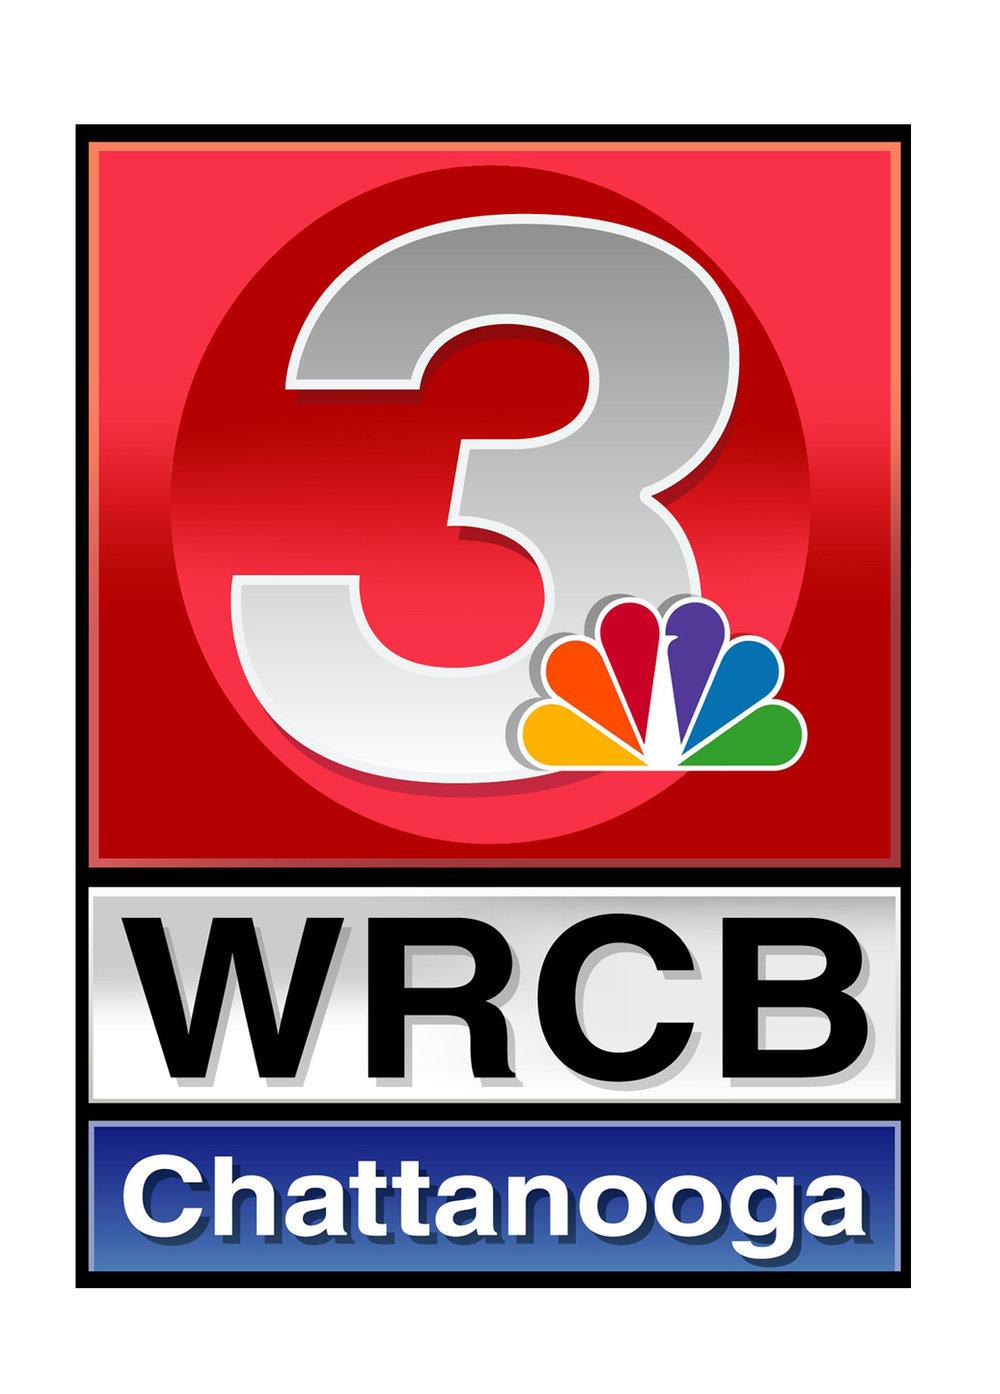 3WRBB logo.jpg